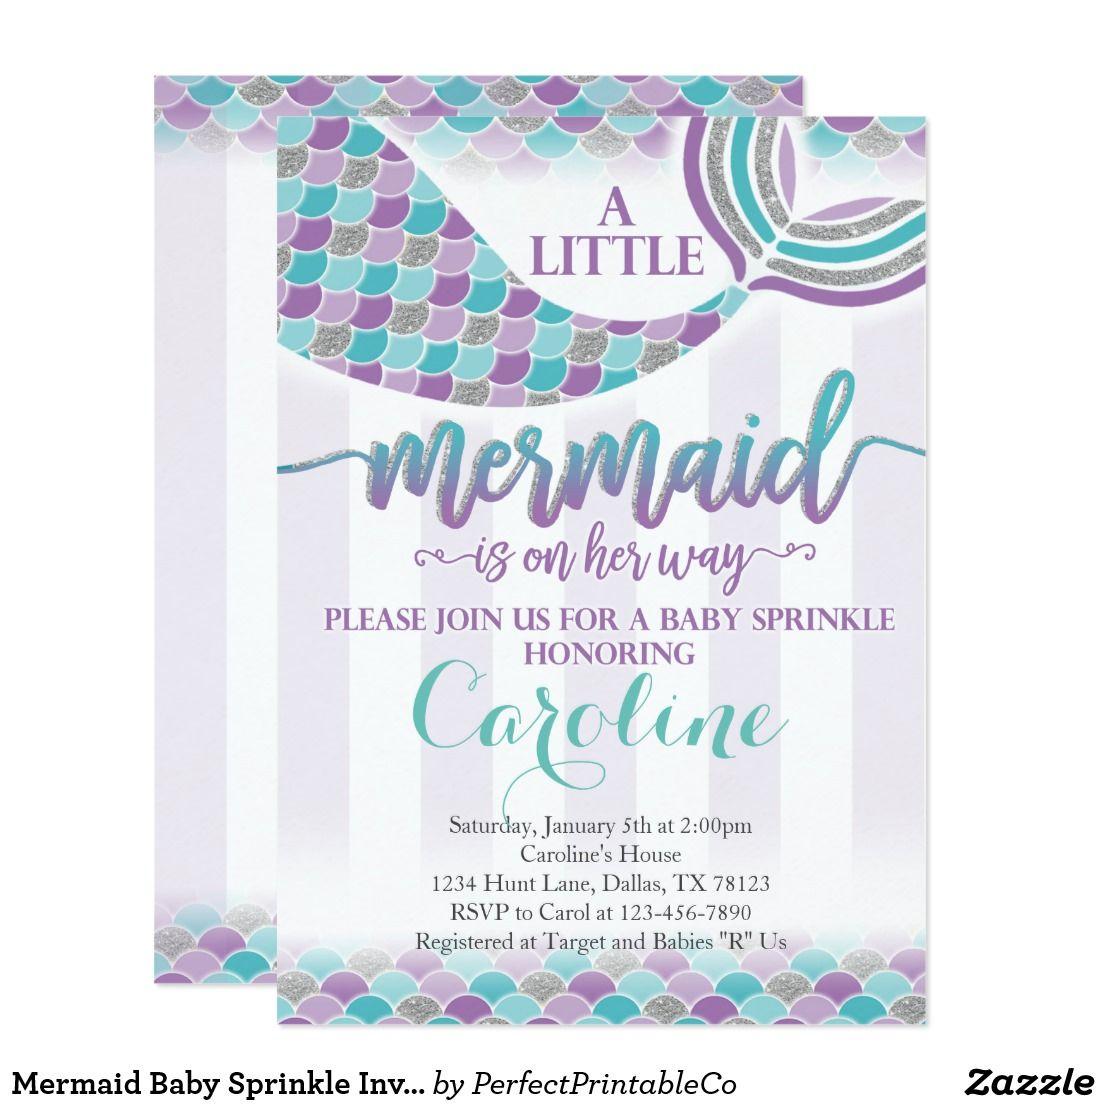 Mermaid Baby Sprinkle Invitation Purple Teal | Invitations and Party ...